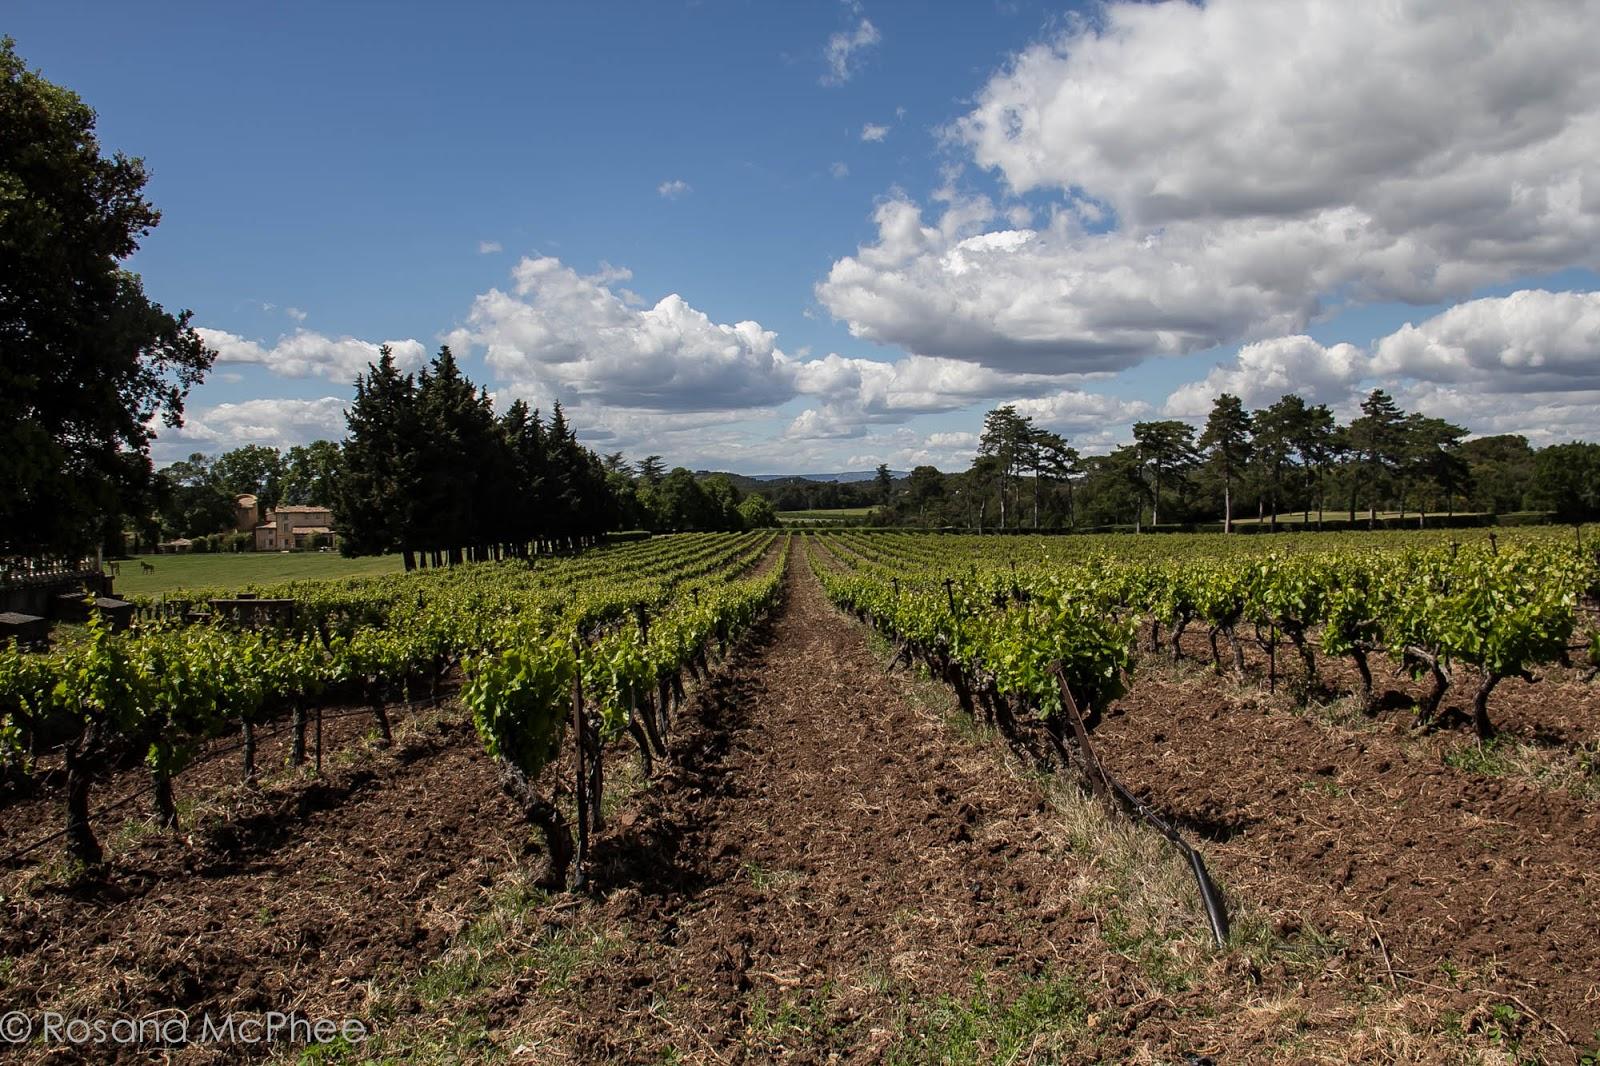 Marvelous Villa Baulieu, Provence Vineyard ...